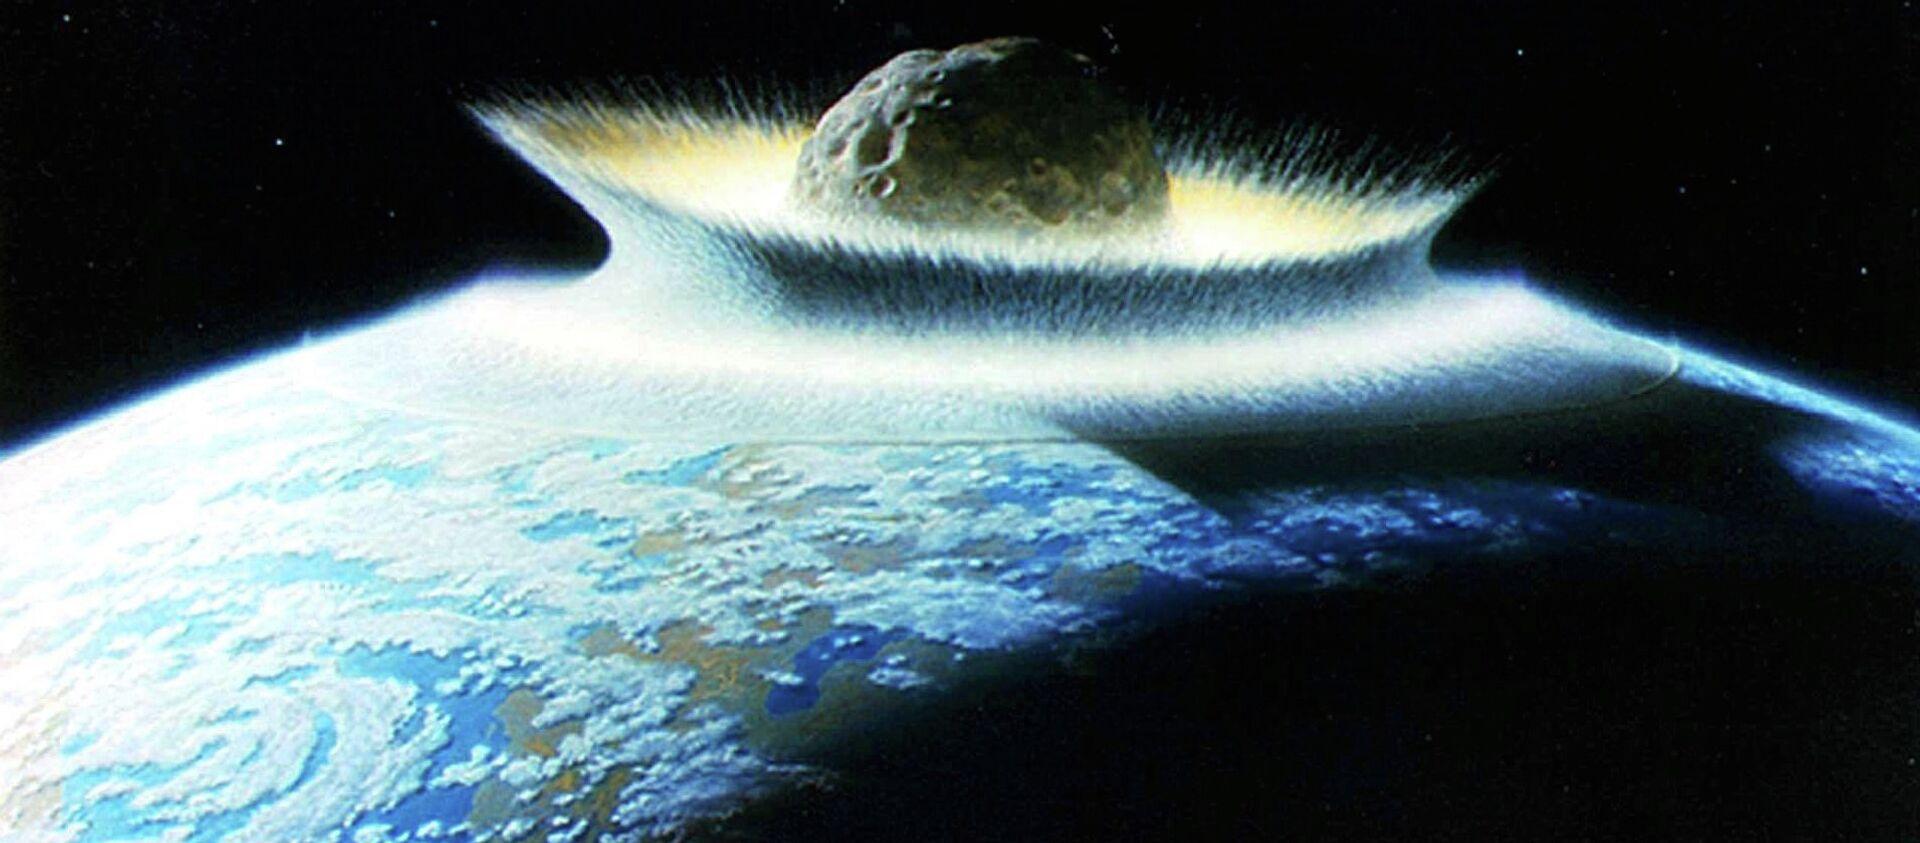 Artist's impression of an asteroid hitting Earth - Sputnik International, 1920, 21.07.2021